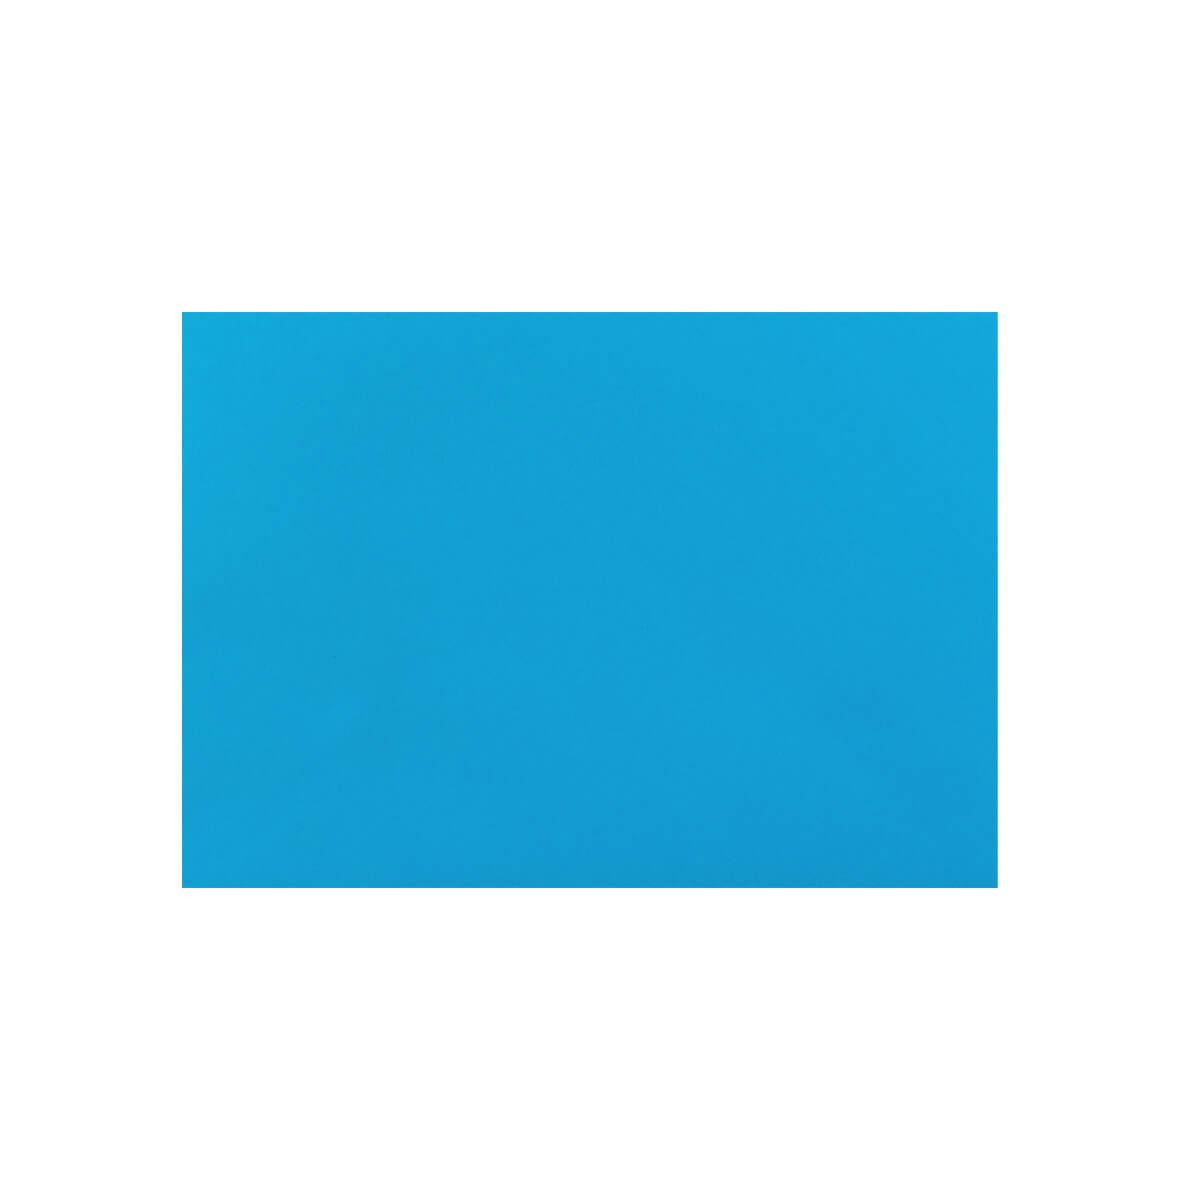 C5 BRIGHT BLUE ENVELOPES 120GSM